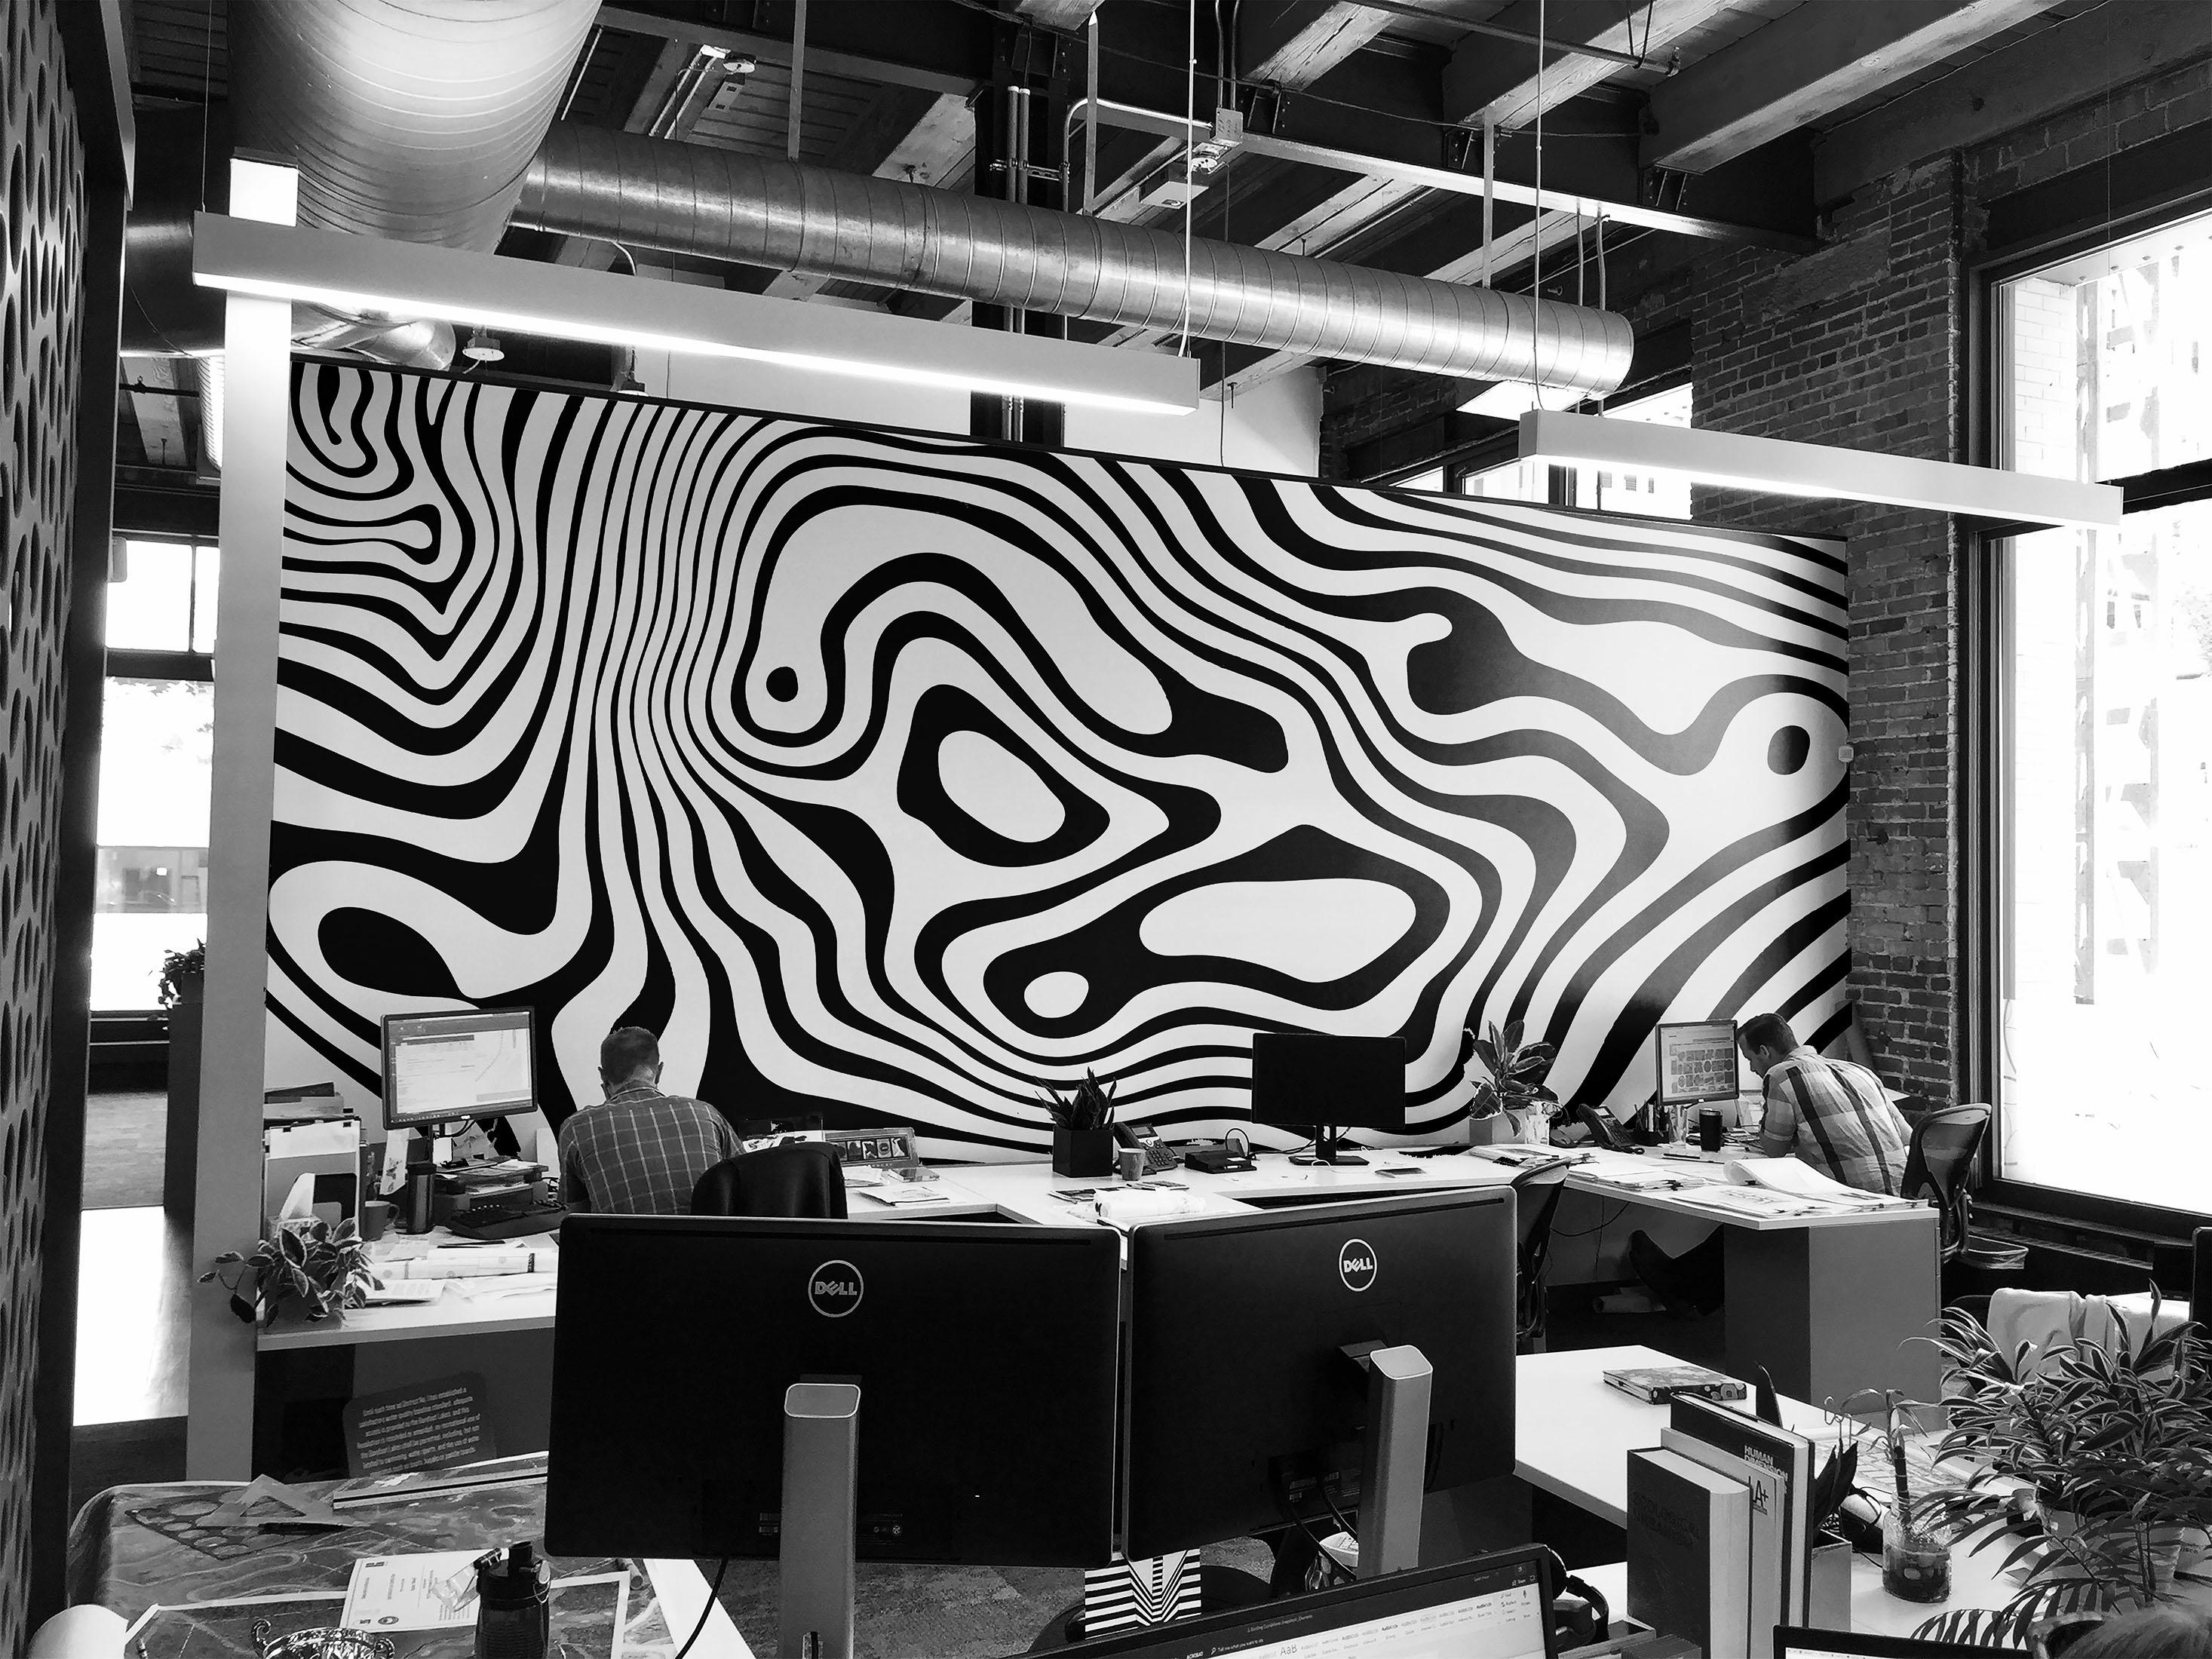 Office Mural Mockup 2